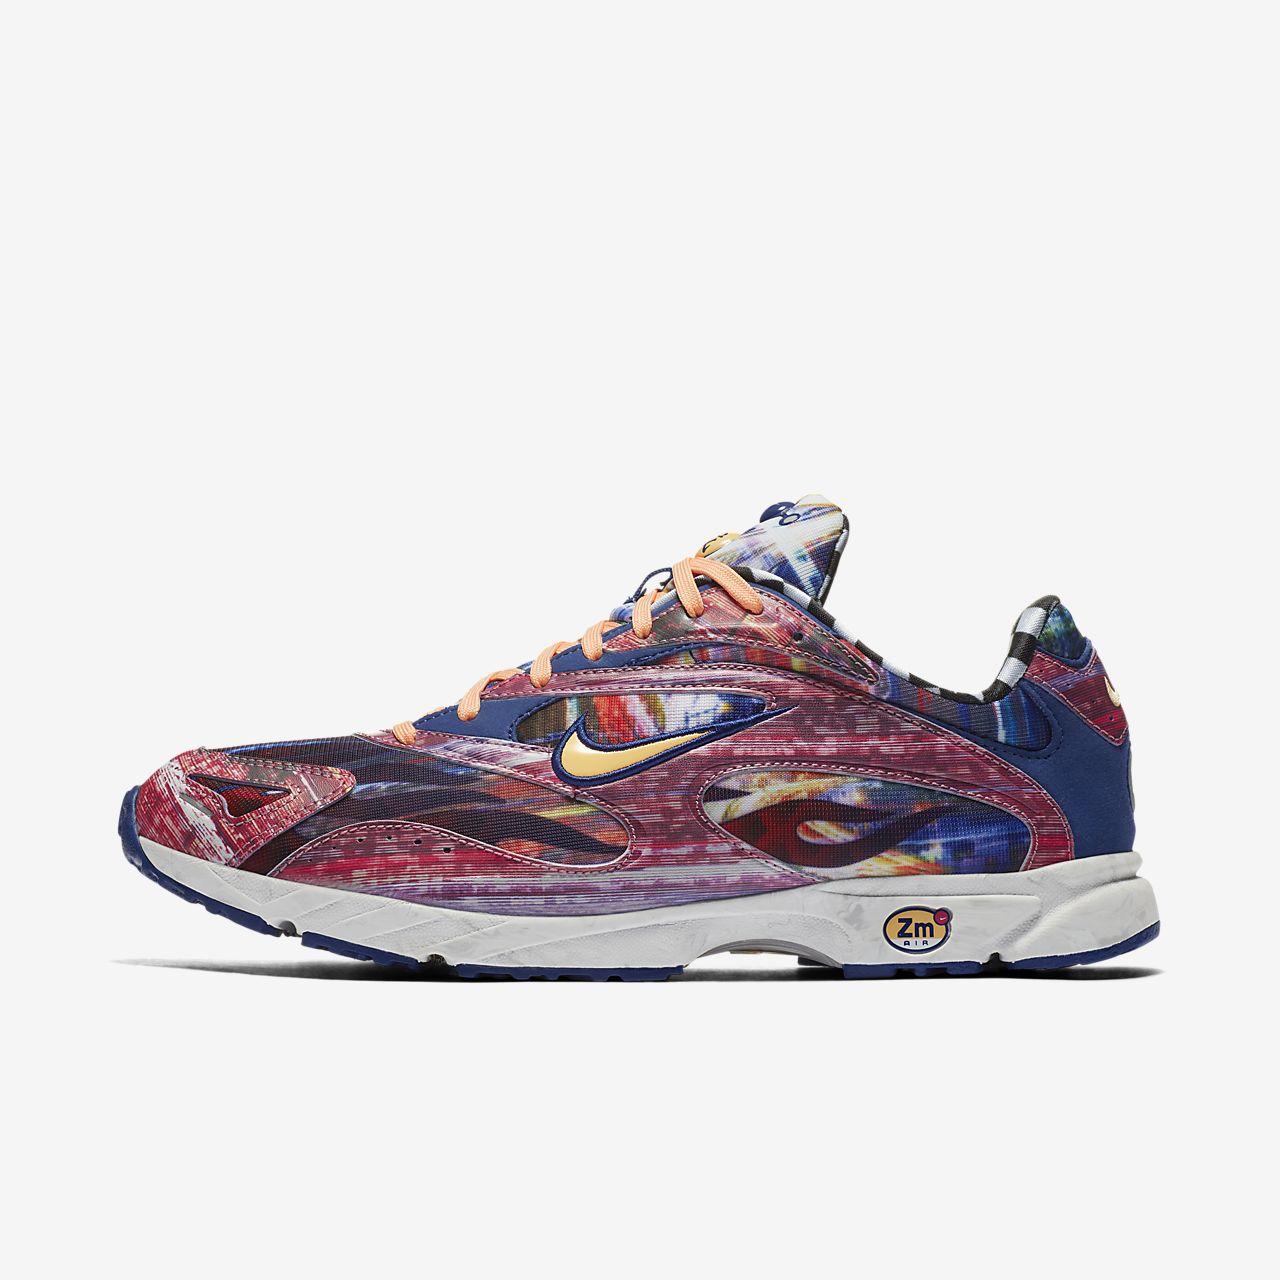 f97e8686d645 Nike Zoom Streak Spectrum Plus Premium Men s Shoe. Nike.com PT